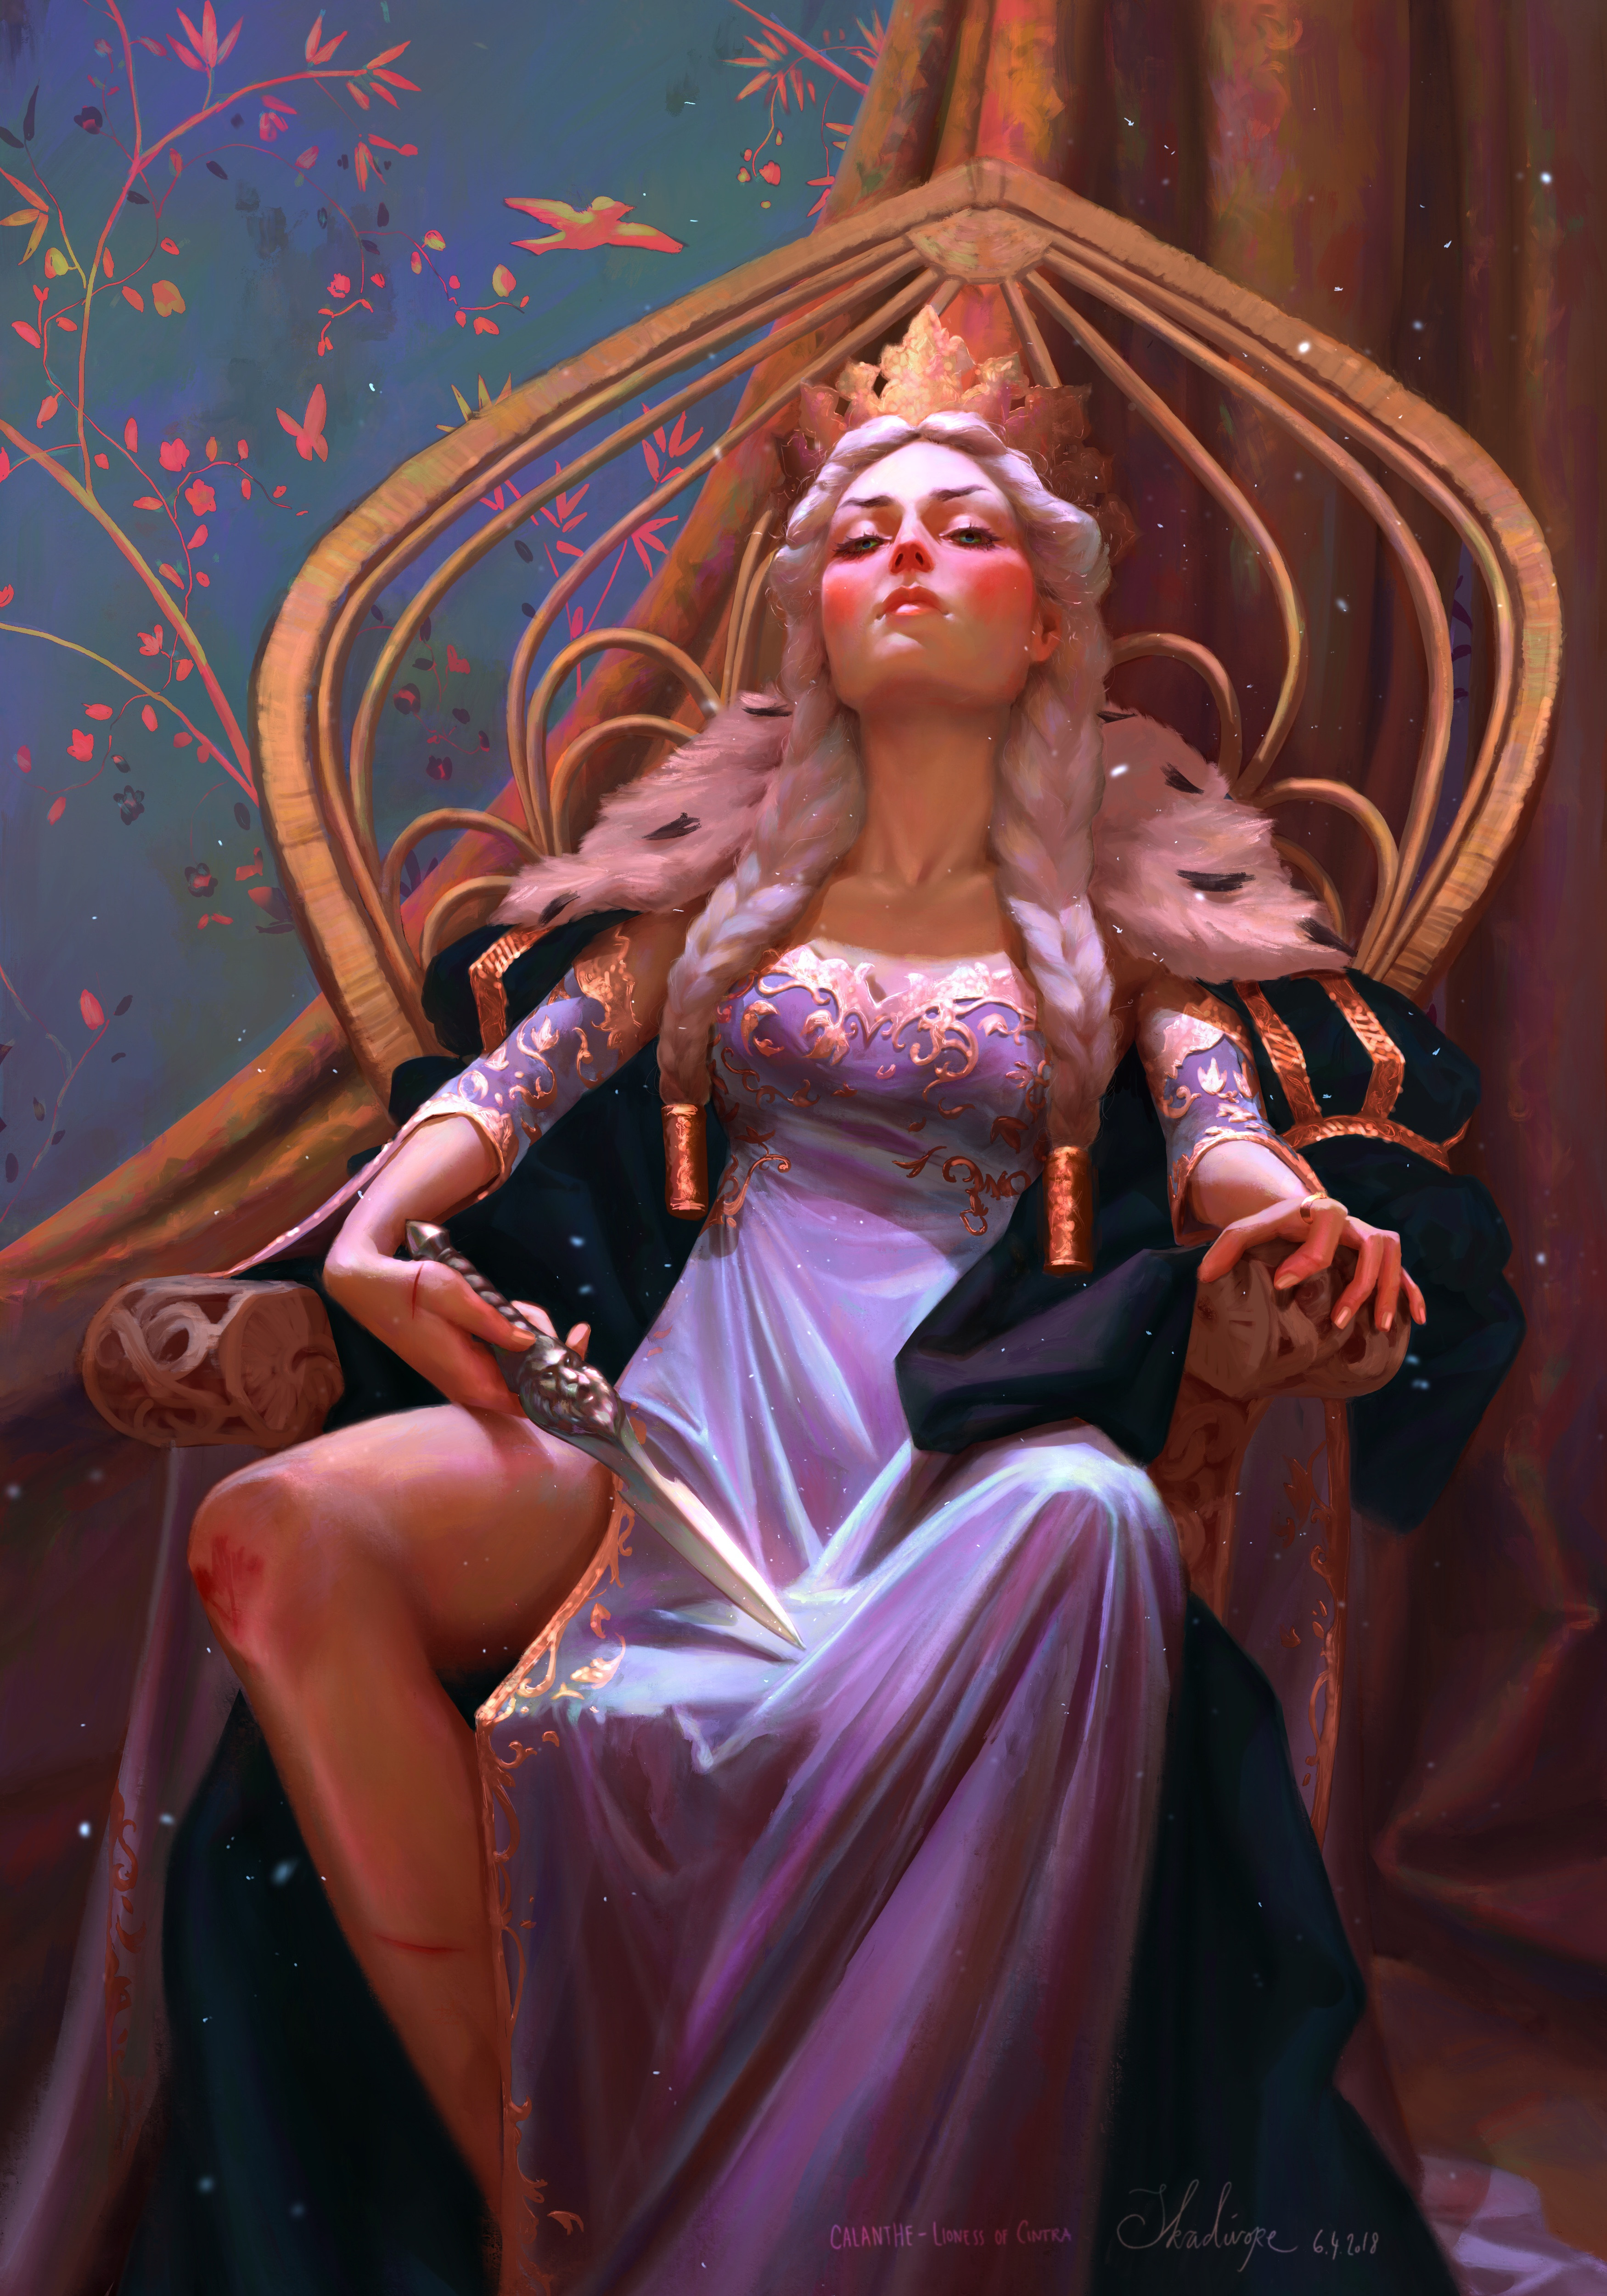 ArtStation - Calanthe - Lioness Of Cintra,